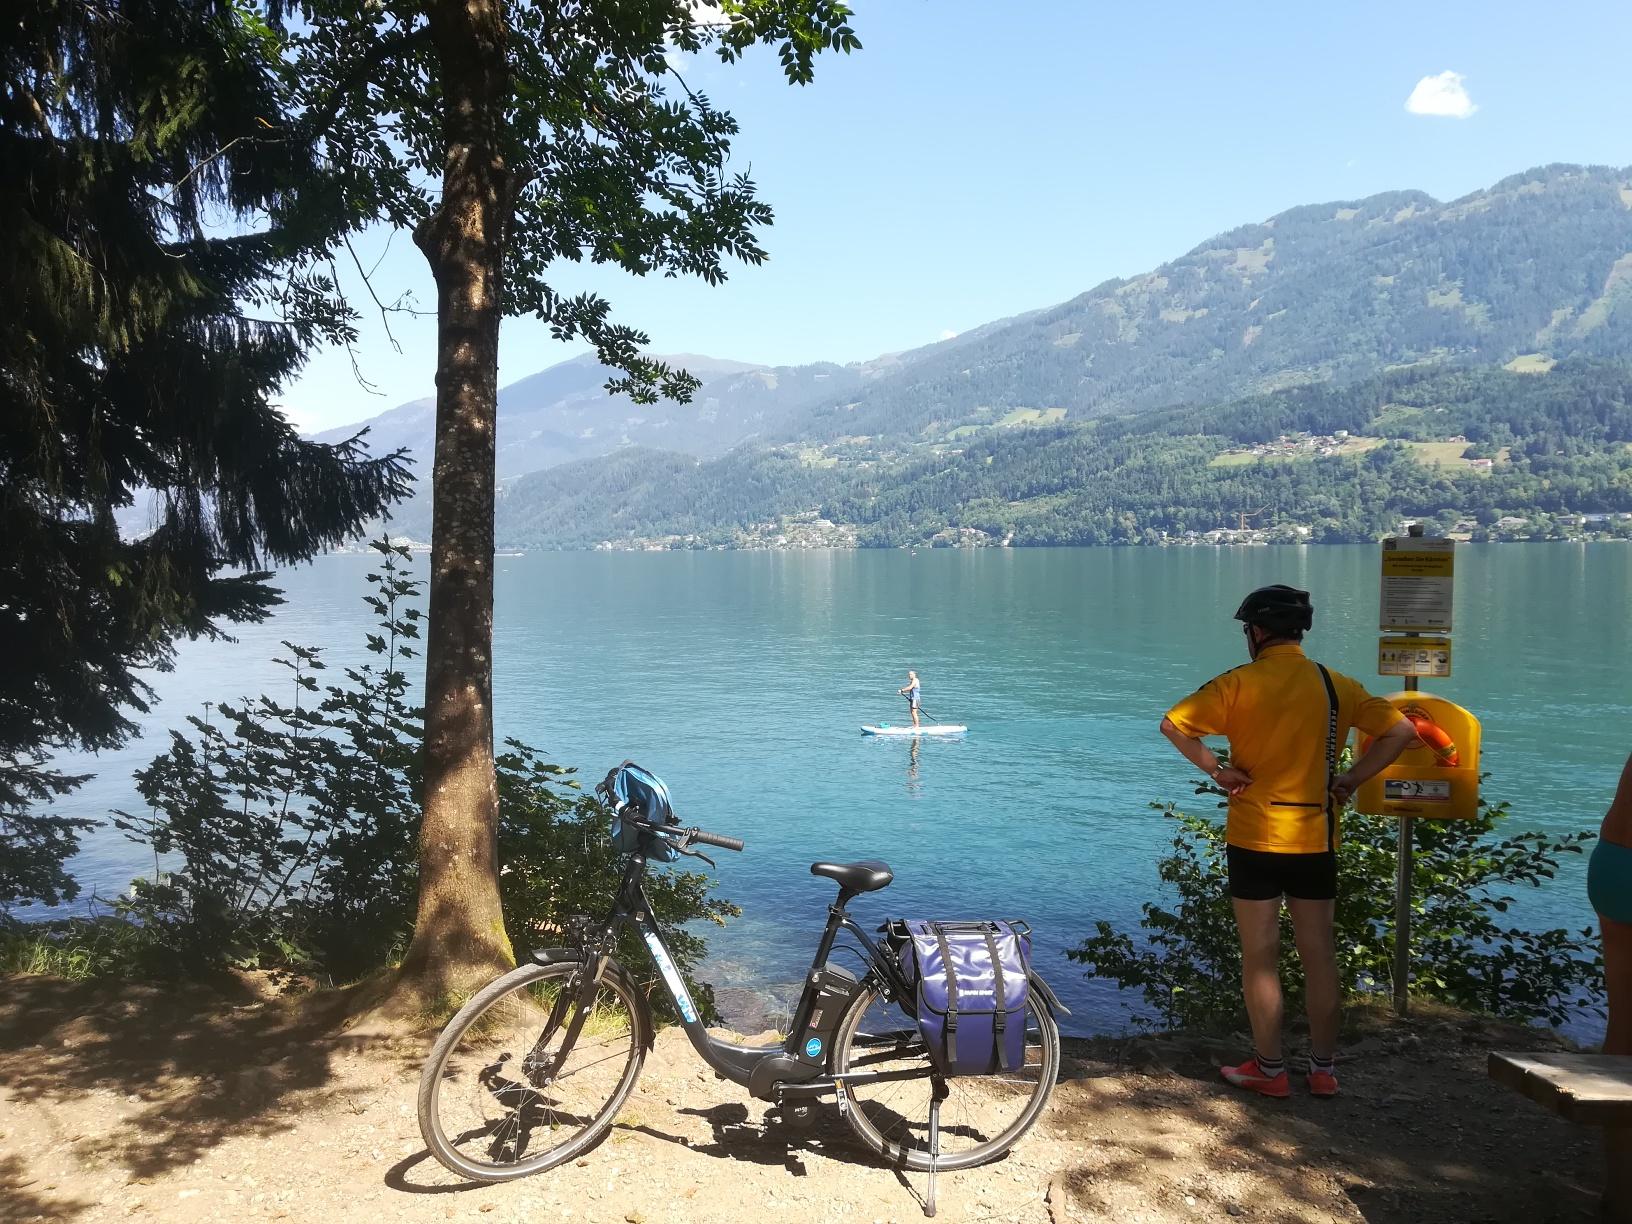 Explore fantastic bike tours in Carinthia - Lake Millstatt by bike